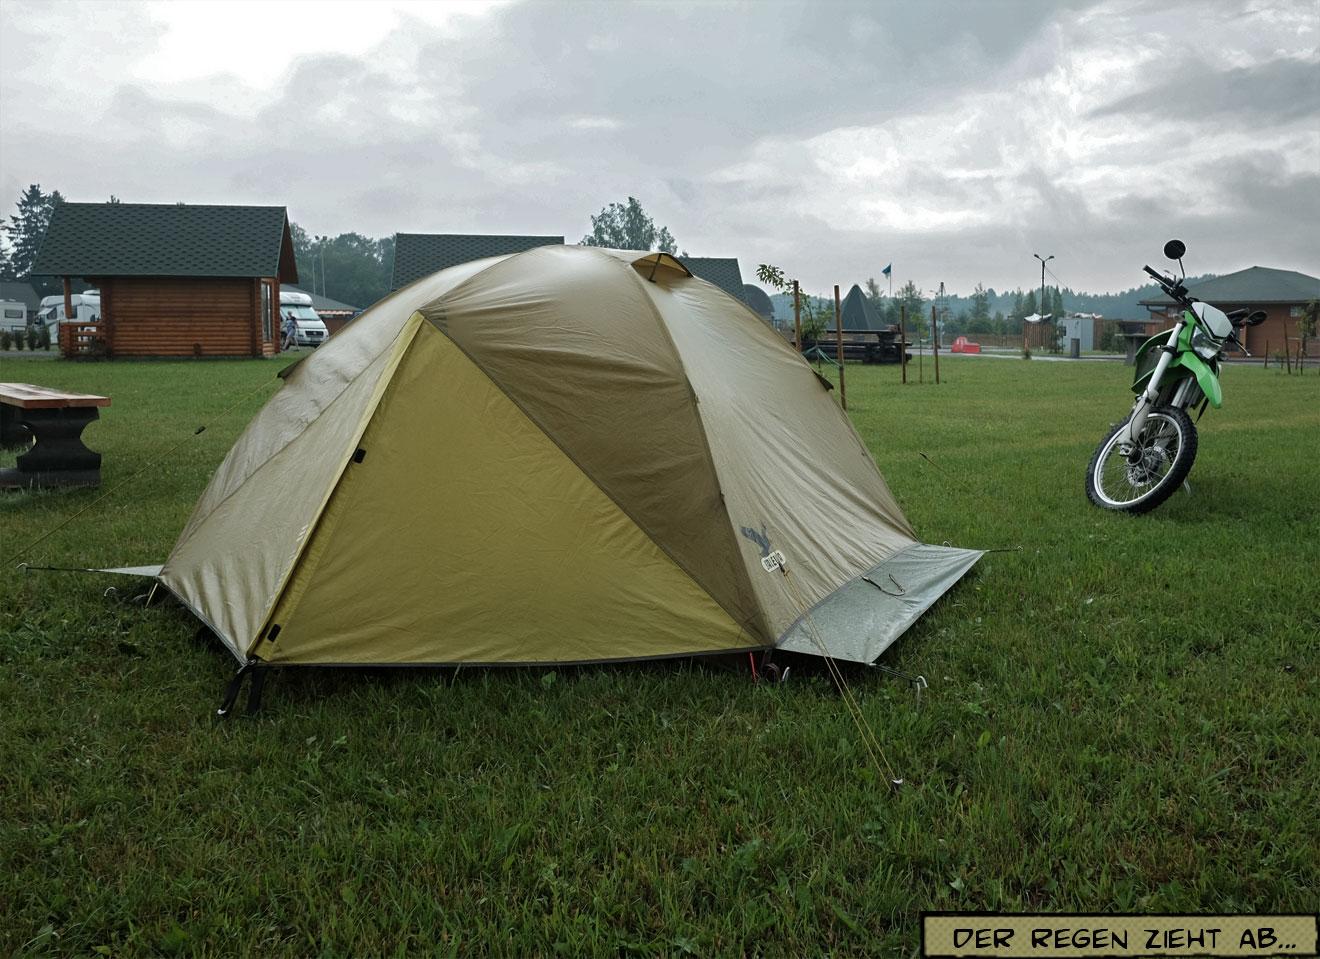 Nasses Zelt und Motorrad